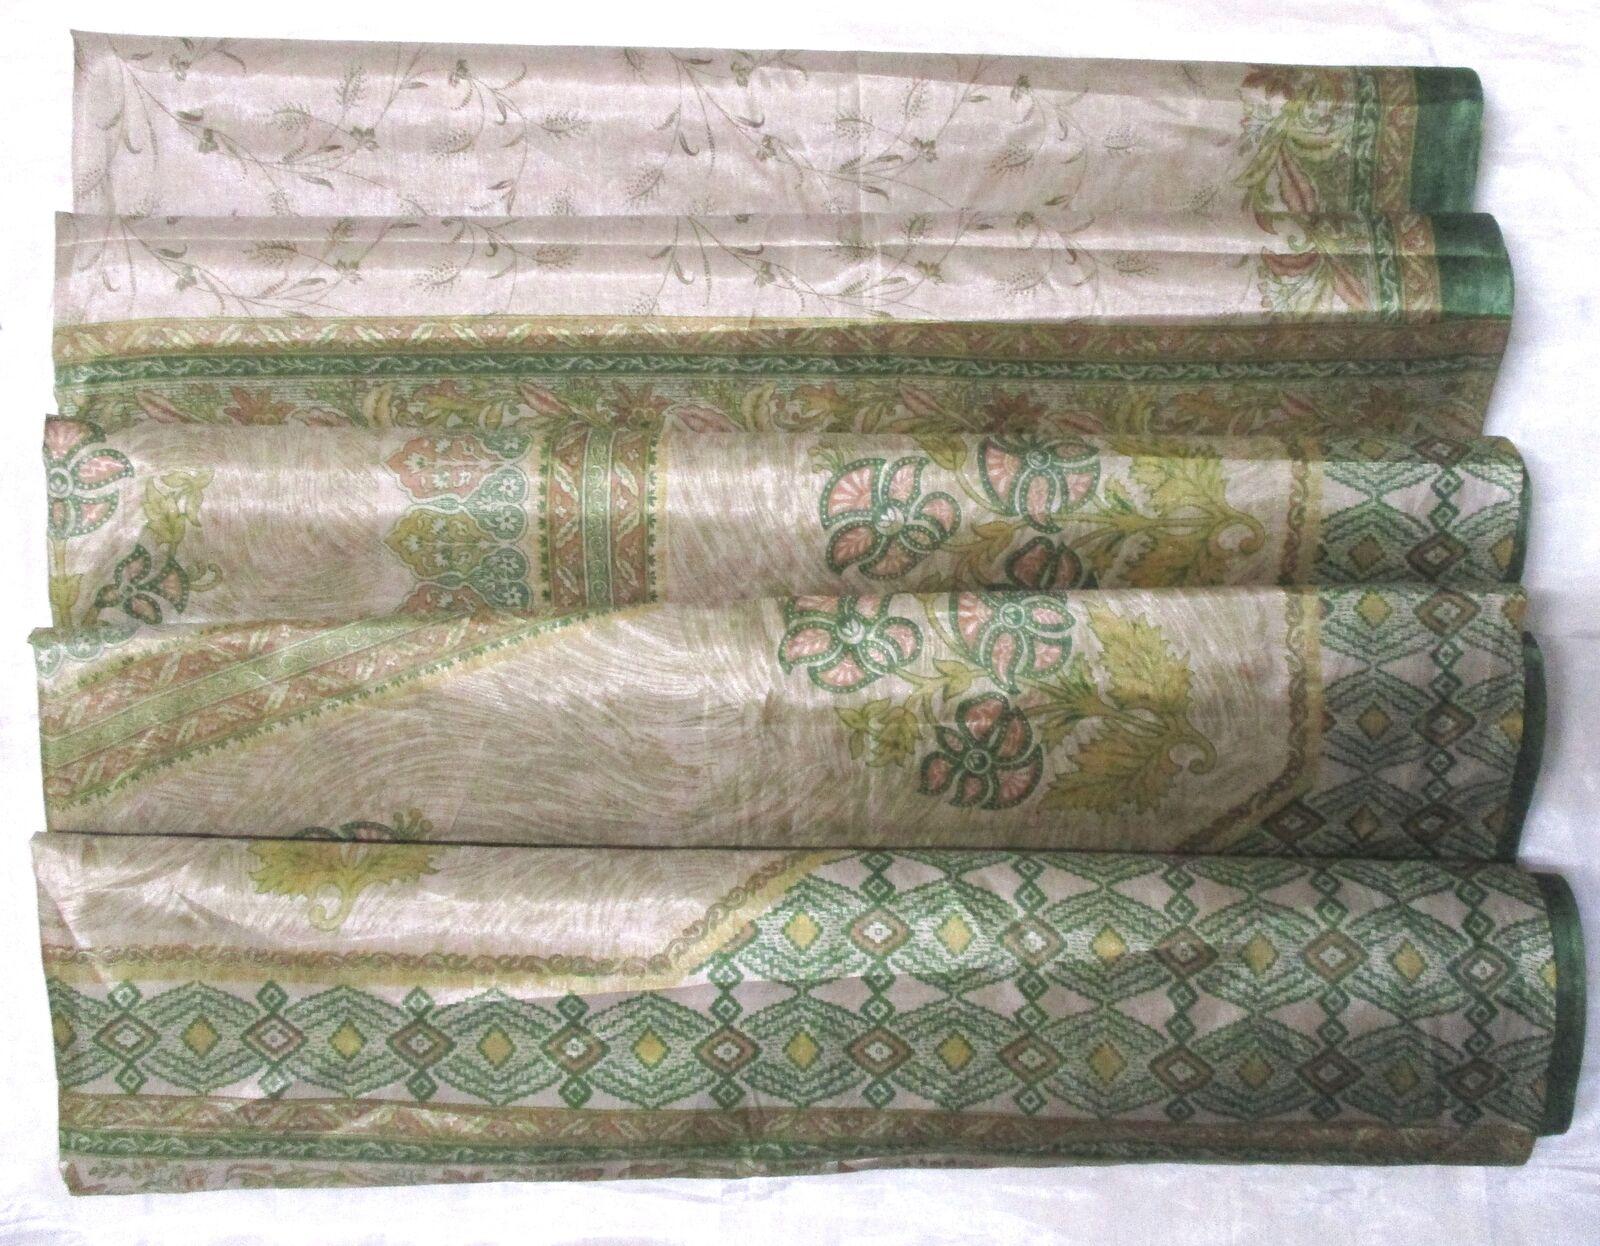 WEARABLE SILK BLEND ANTIQUE VINTAGE SARI SAREE 5 YD A1 335 Green Khaki #ABHVO